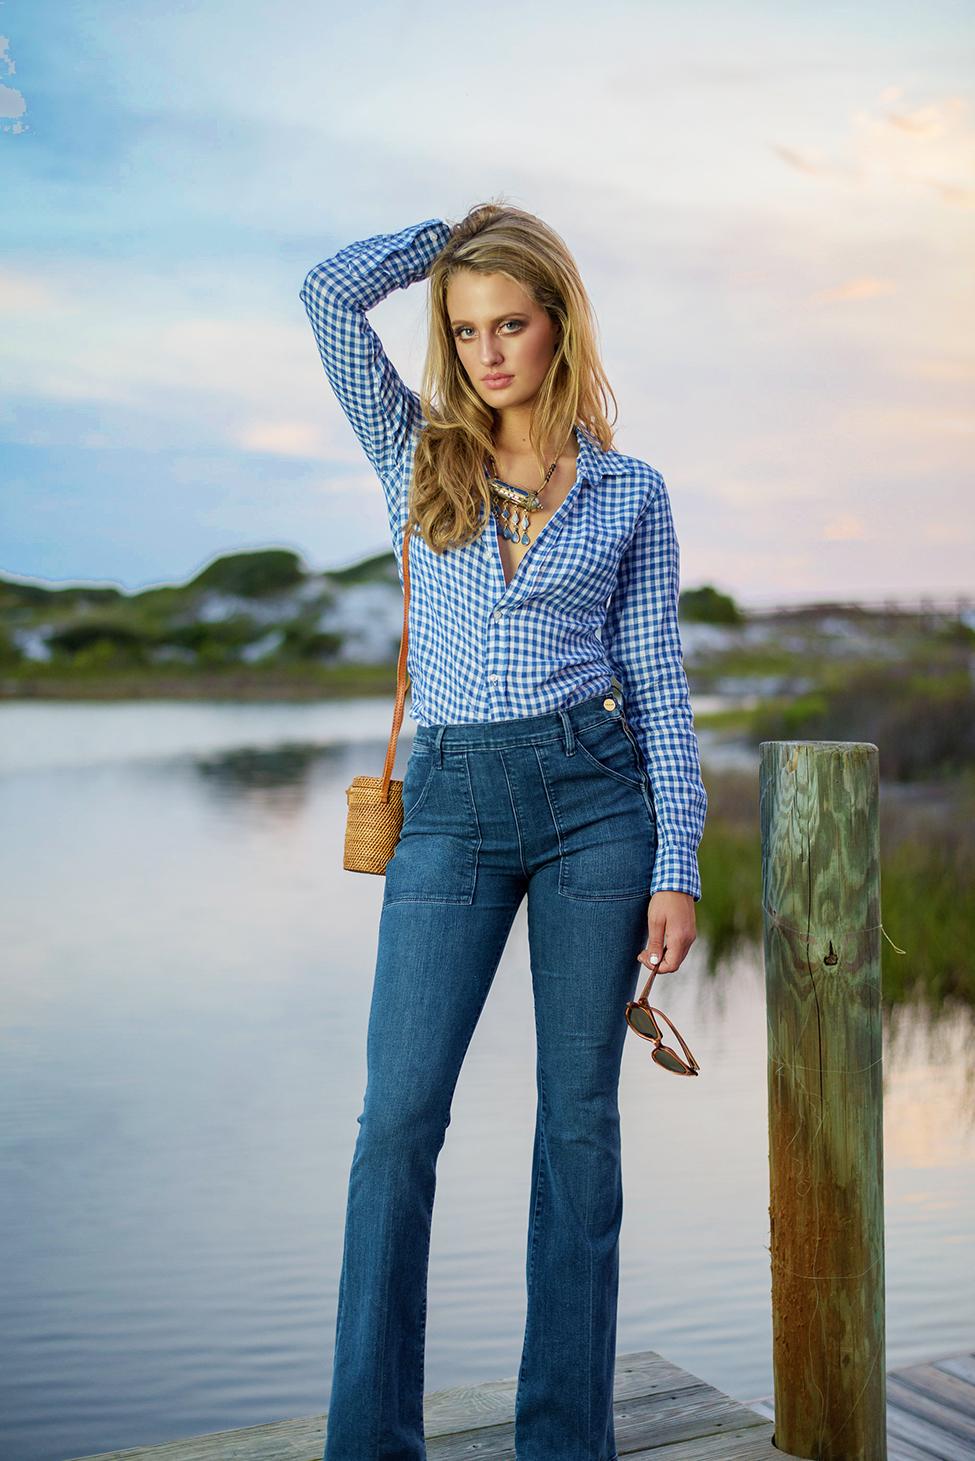 30A Street Style - Back to Cool Coastal Fall Fashion -170